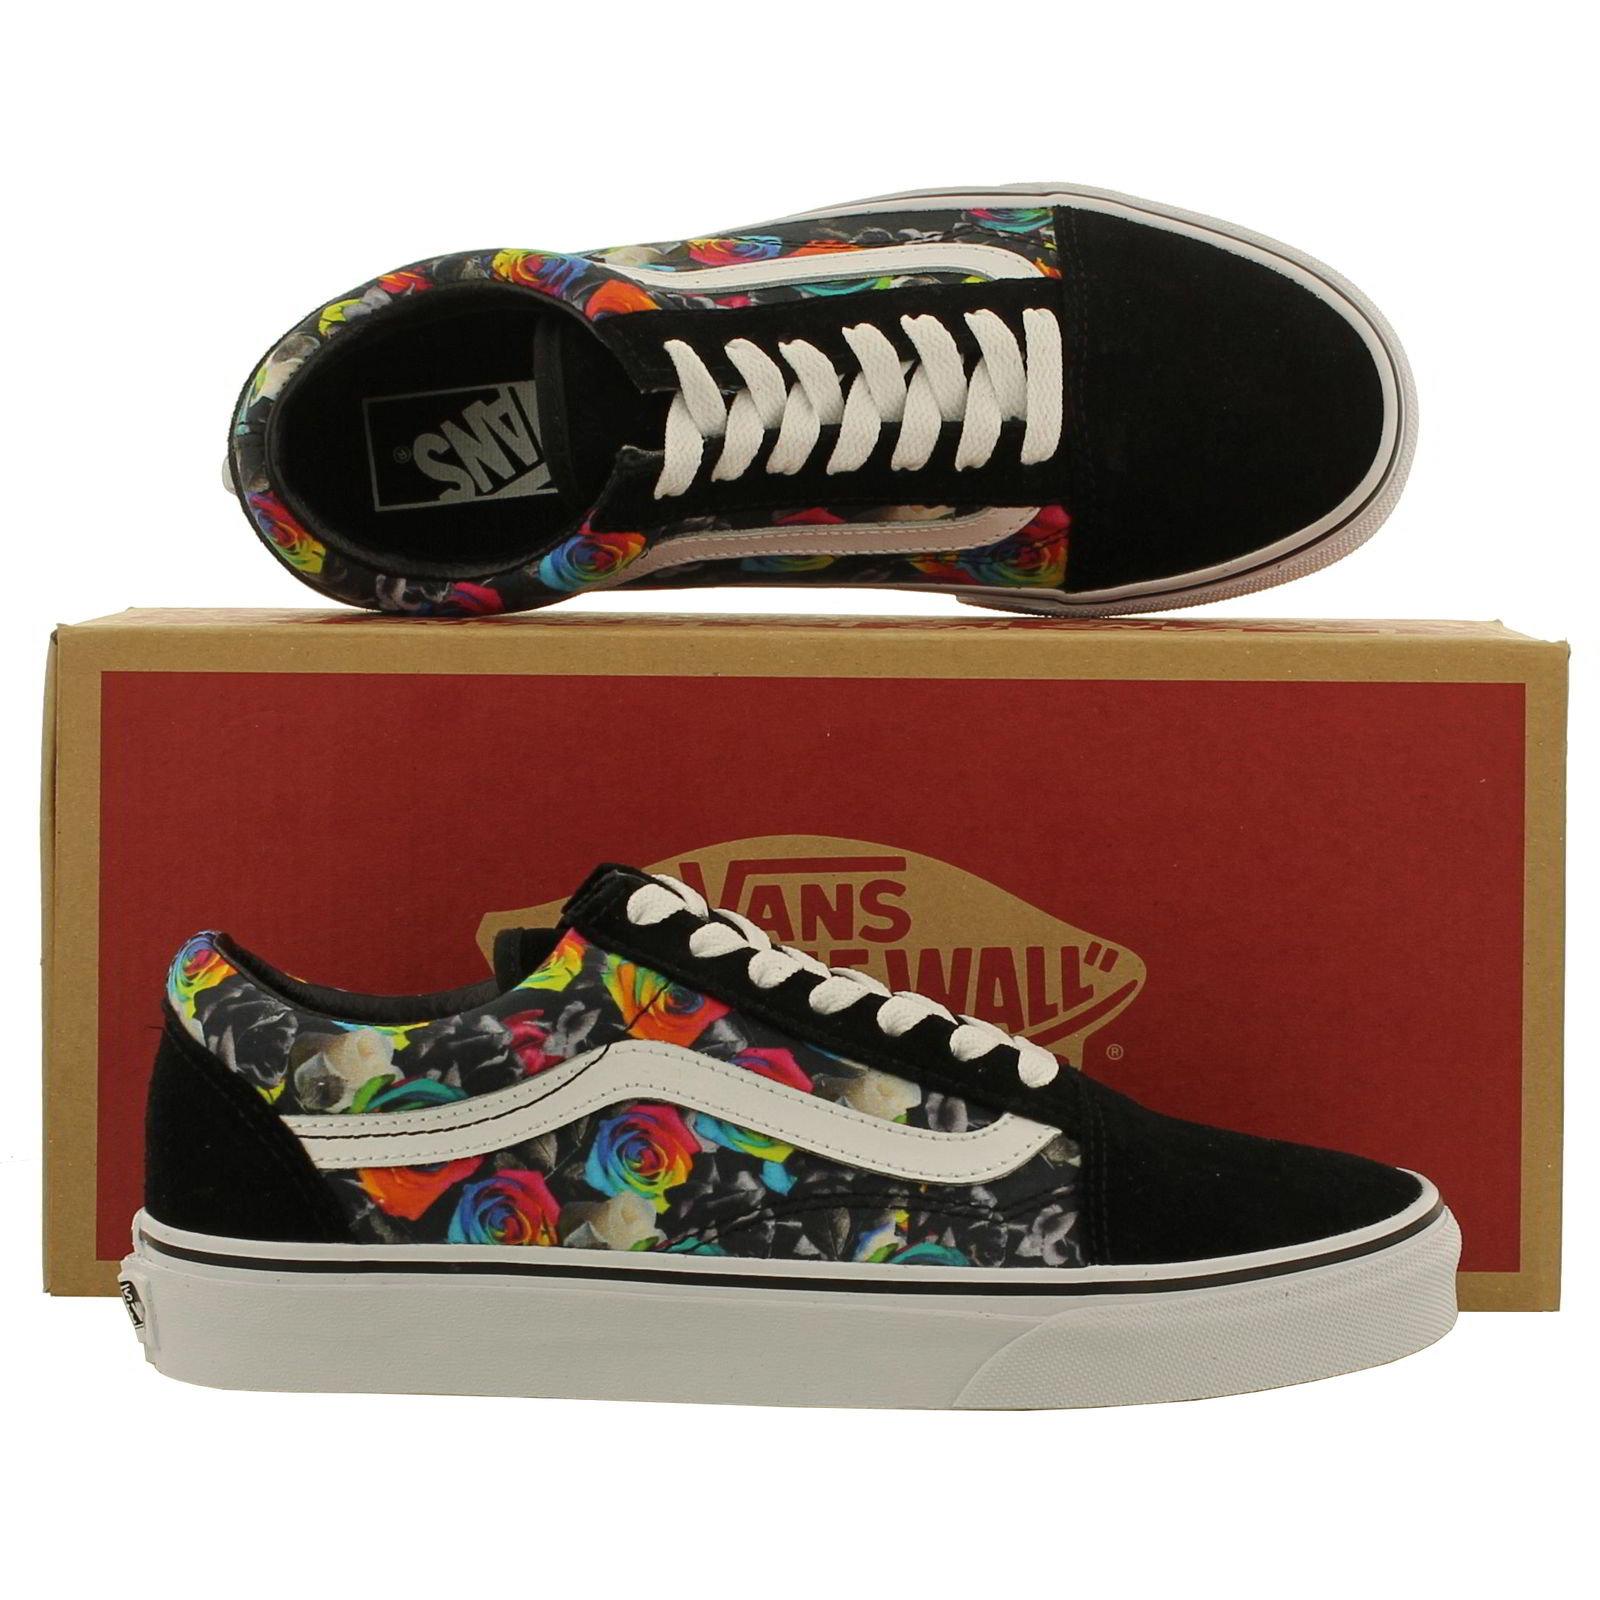 dd966b0276a3 Vans Old Skool Original Skateboarding Shoes Outdoor Rainbow Retro